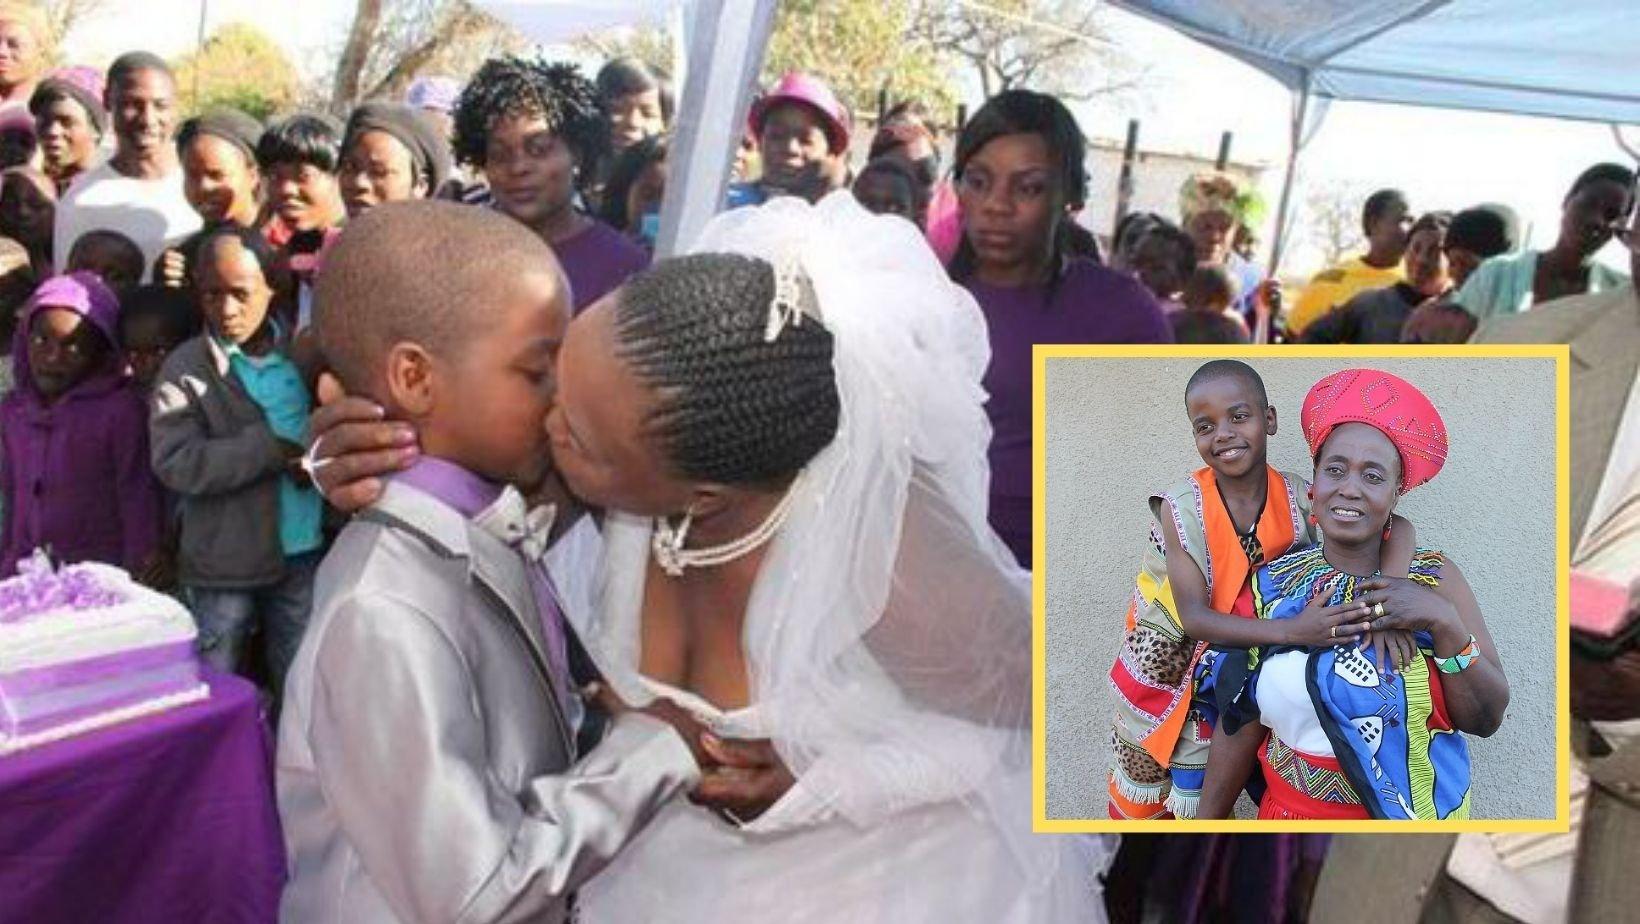 1 116.jpg?resize=412,232 - Woman, 62, Marries Boy, 9, In A 'Sickening' Wedding Ceremony